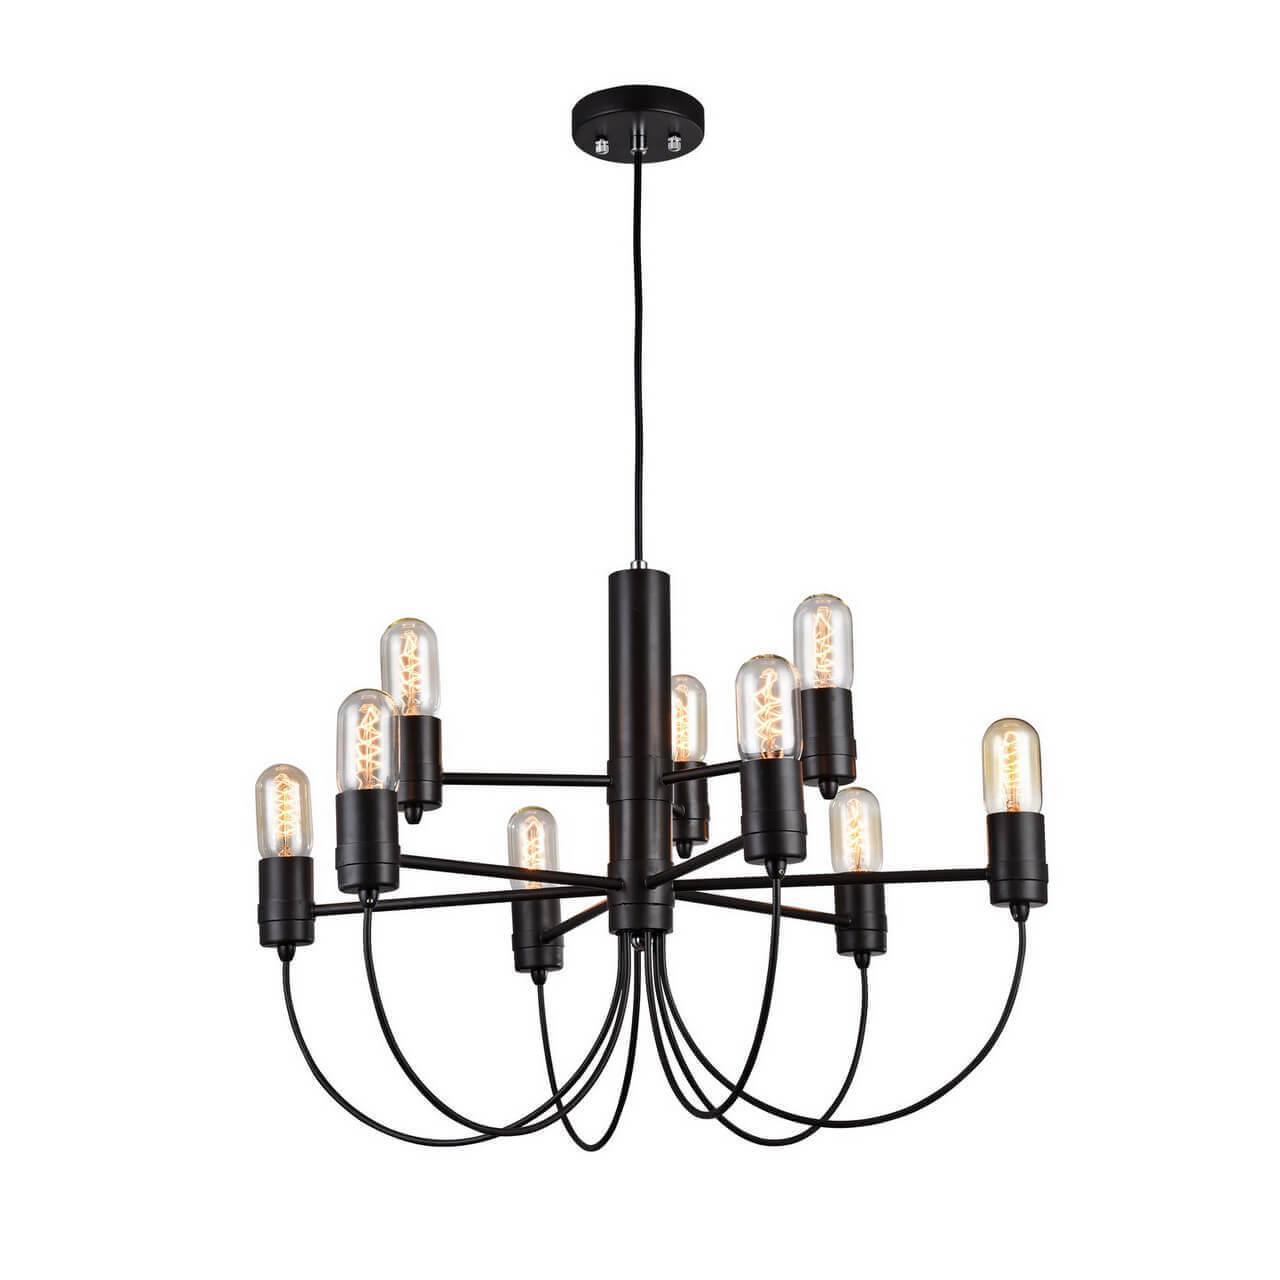 Фото - Подвесной светильник Favourite 1522-9P, E27, 60 Вт подвесная люстра nano 1522 9p